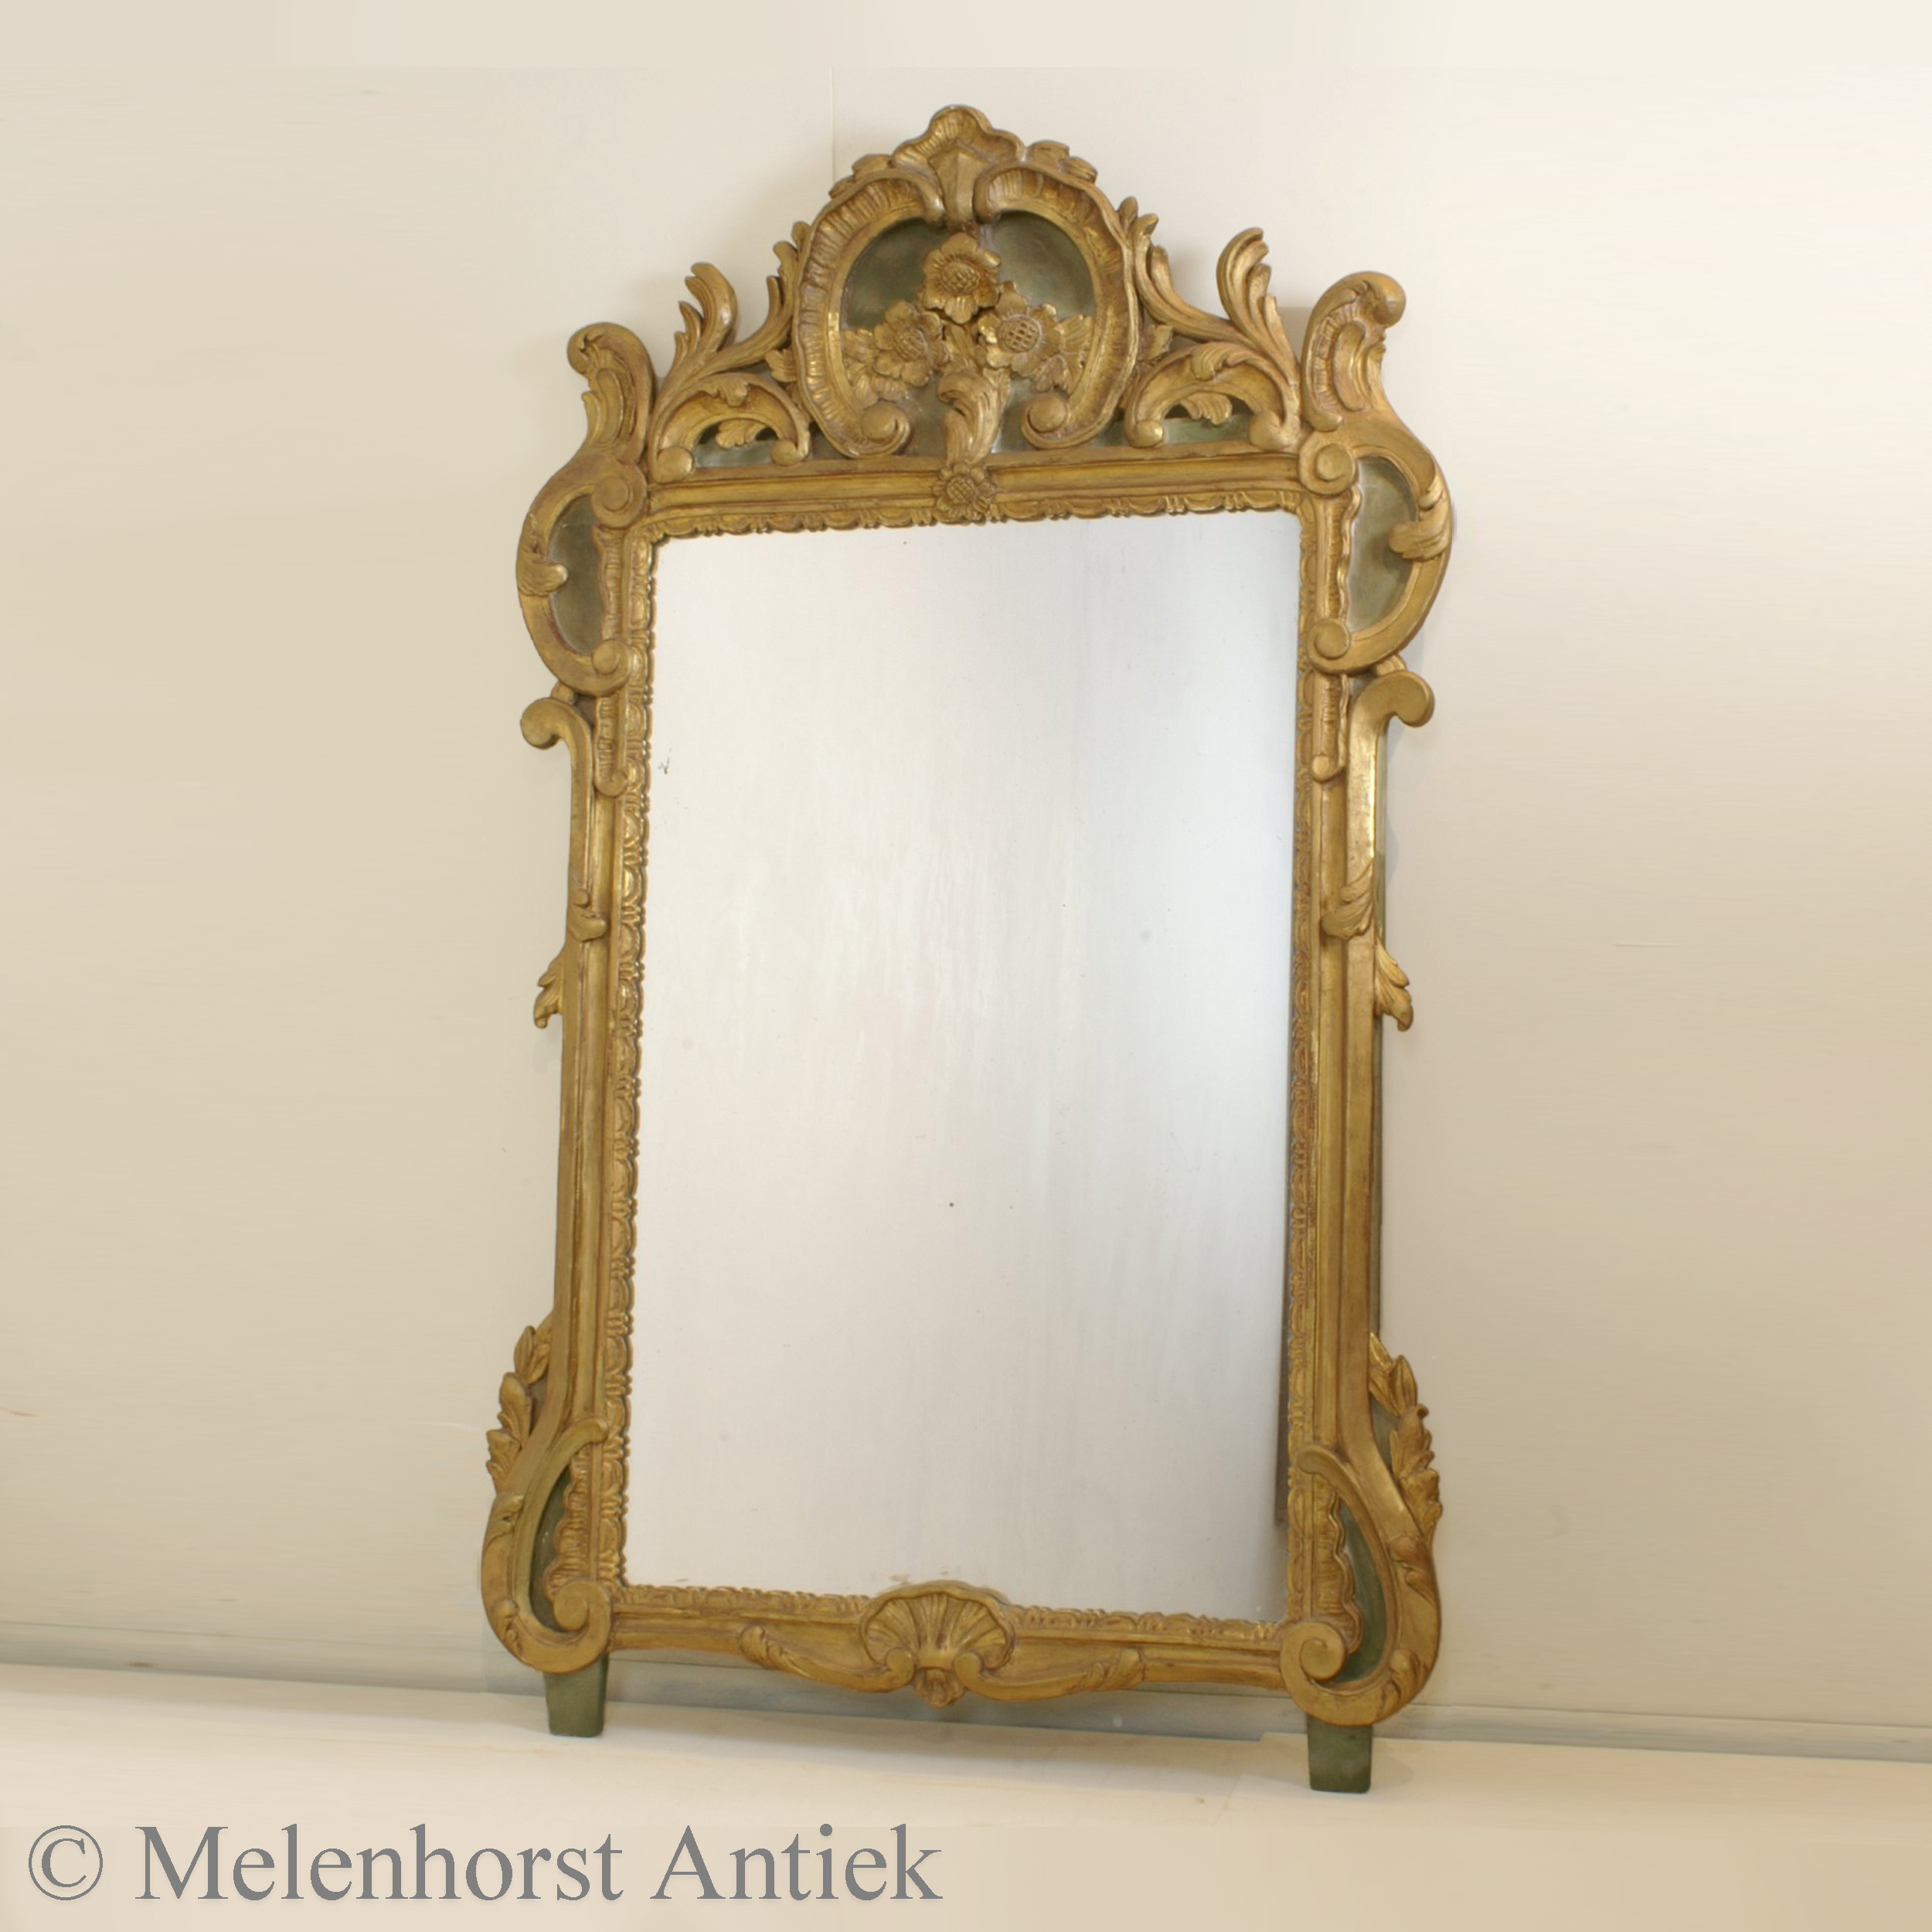 18e-eeuwse vergulde houten spiegel